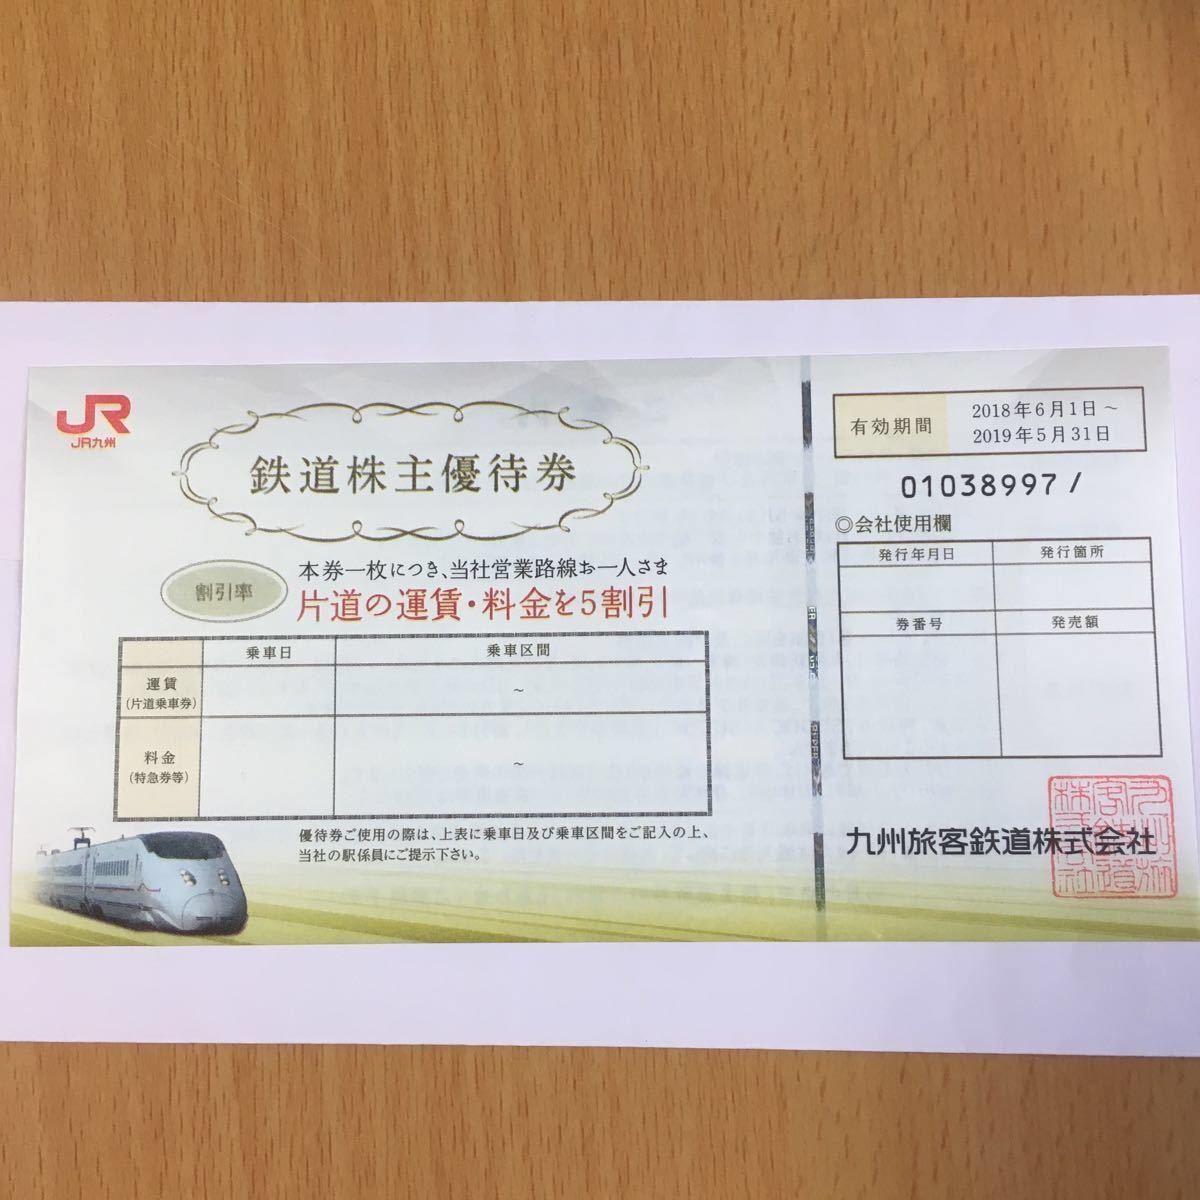 JR鉄道株主優待券